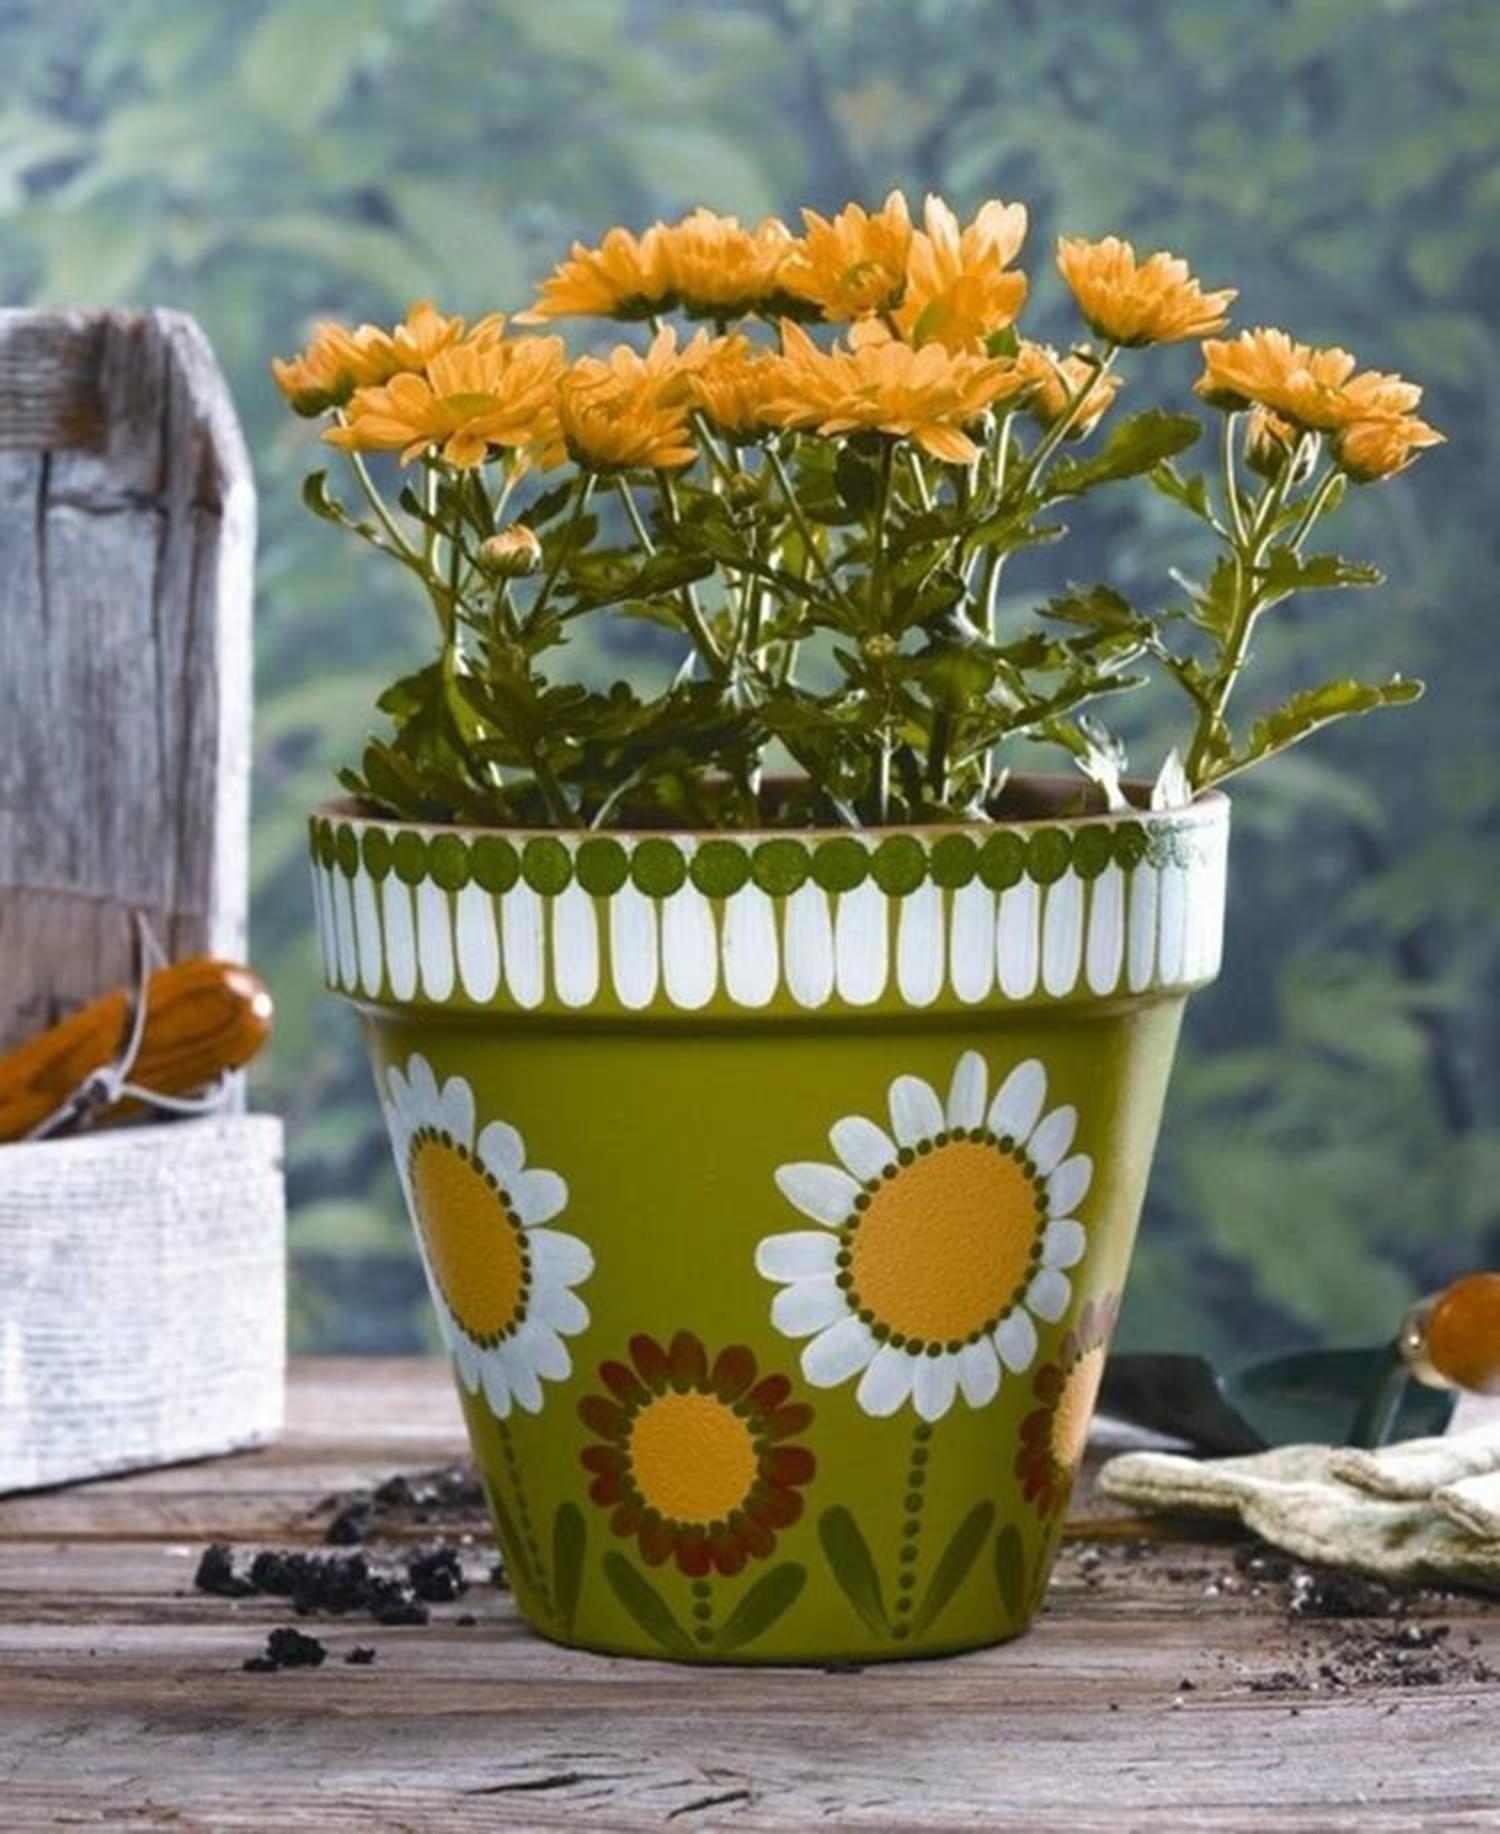 25 Simple Easy Flower Pot Painting Ideas Craft Home Ideas Painted Flower Pots Clay Flower Pots Flower Pot Design,Flower Easy Ganesh Rangoli Designs For Diwali